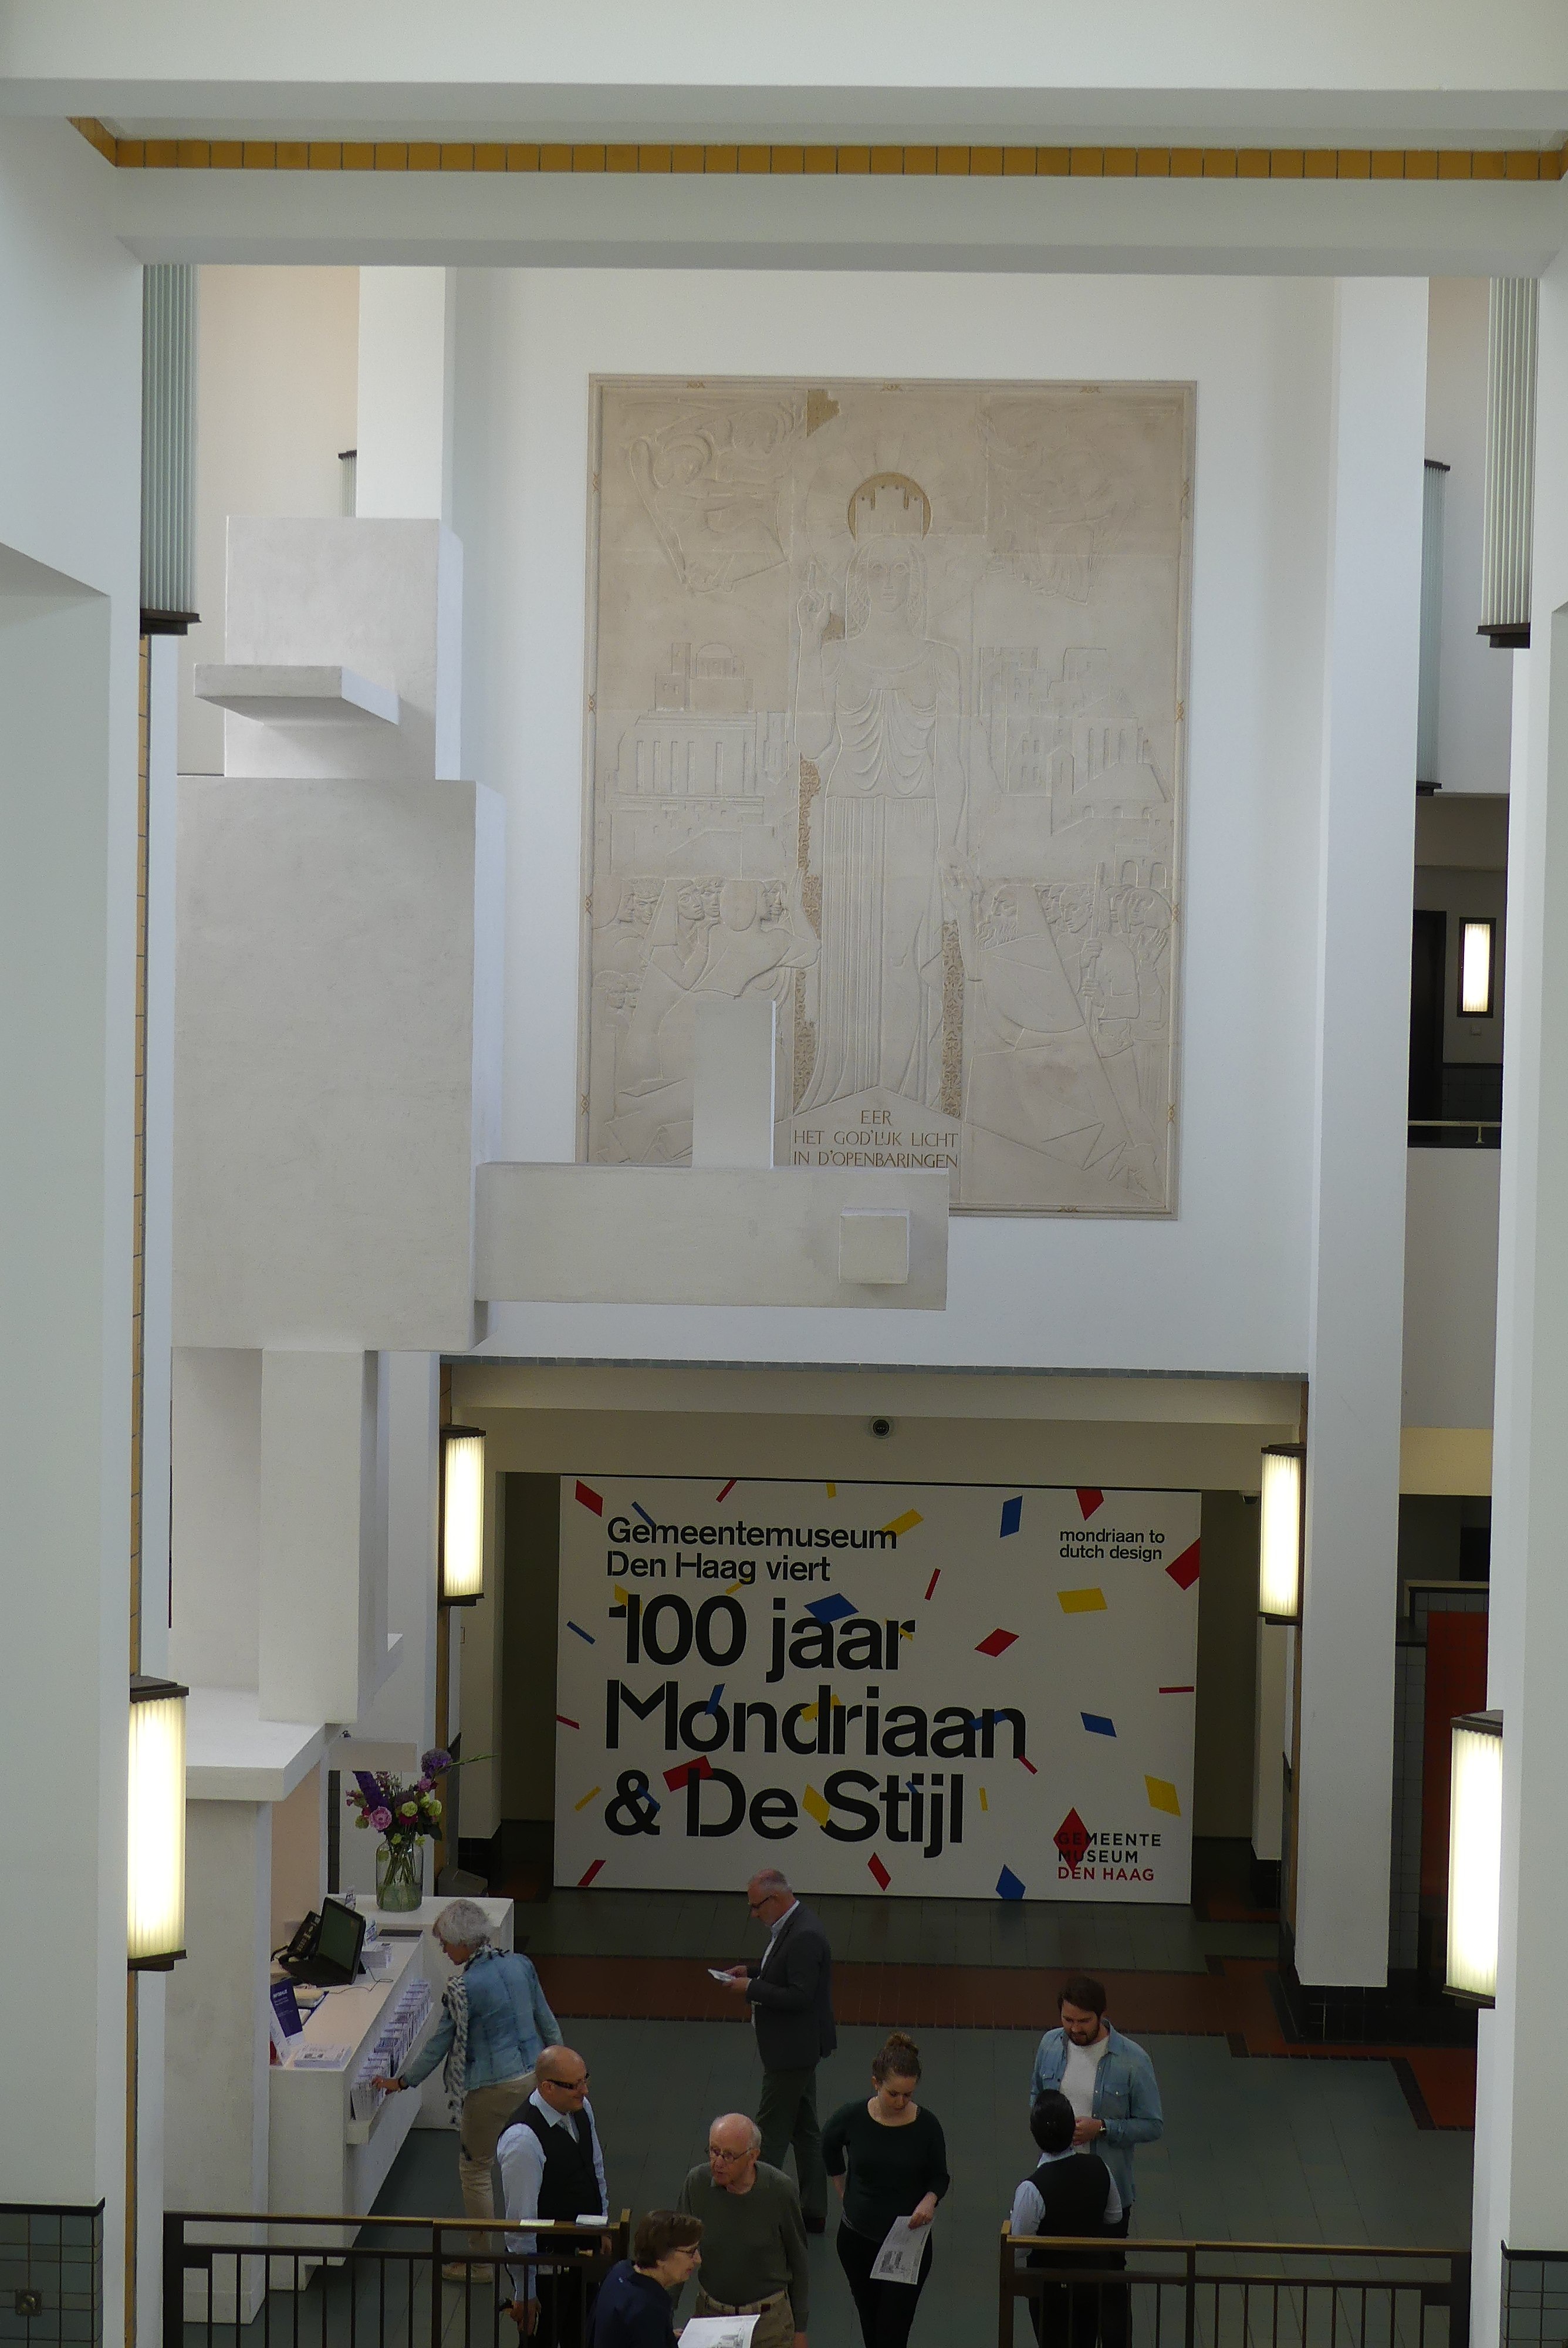 File:Interieur Gemeentemuseum Den Haag P1040975.jpg - Wikimedia Commons